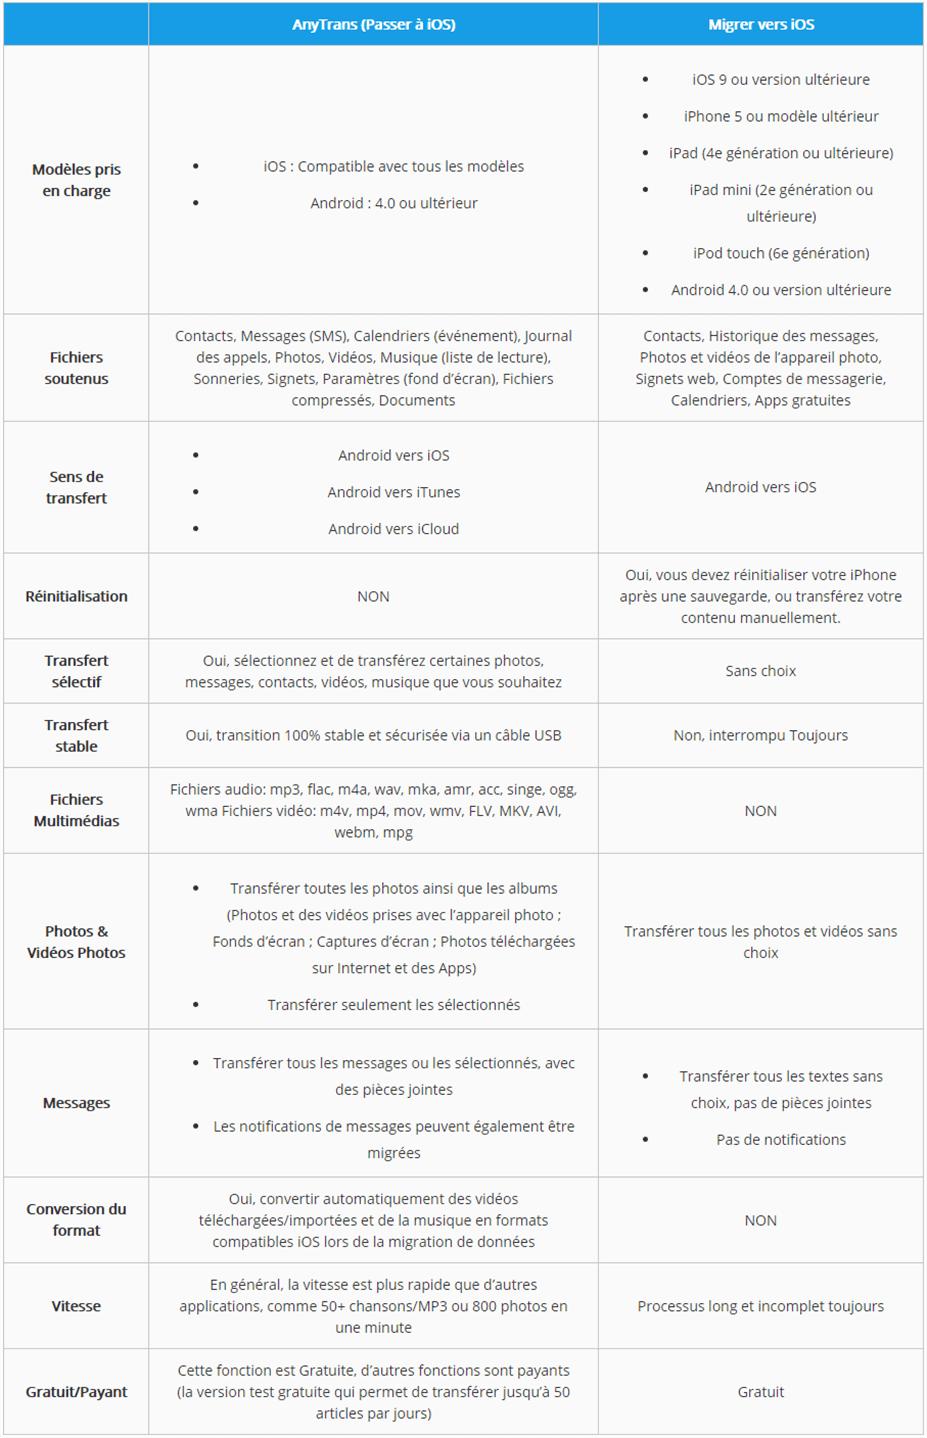 Comparer AnyTrans et Migrer vers iOS